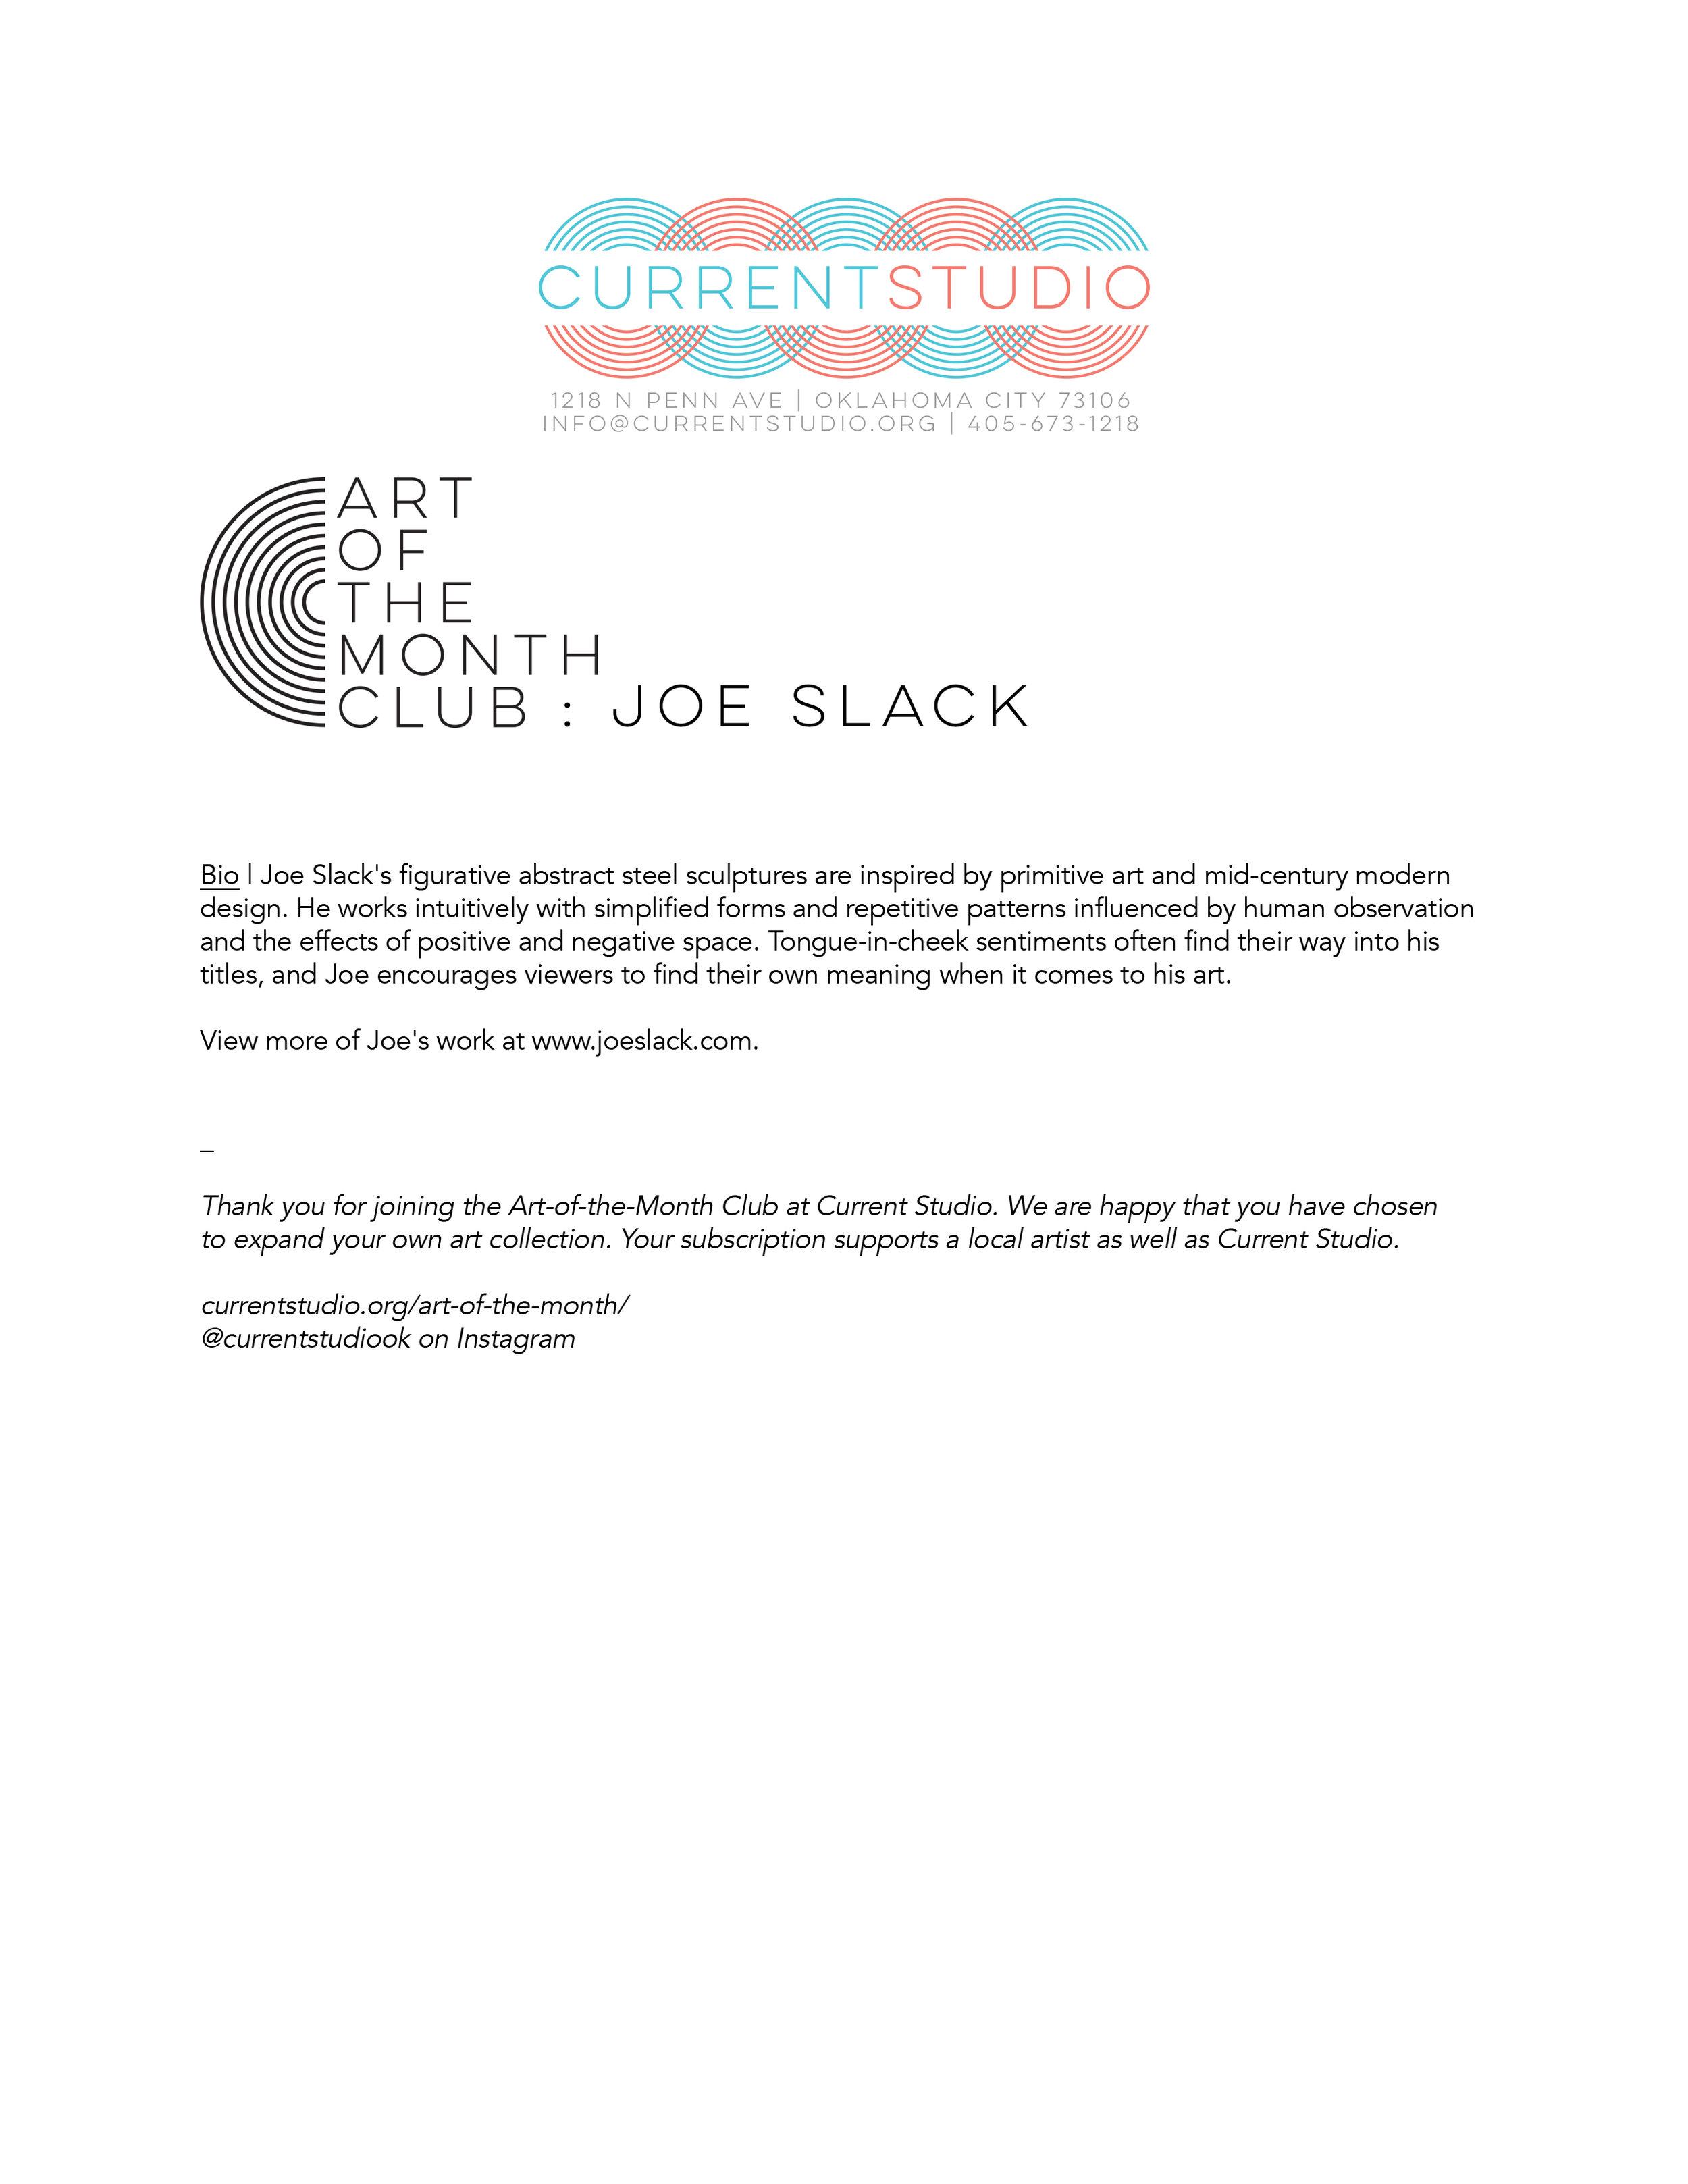 art of the month artist sheet - joe slack.jpg